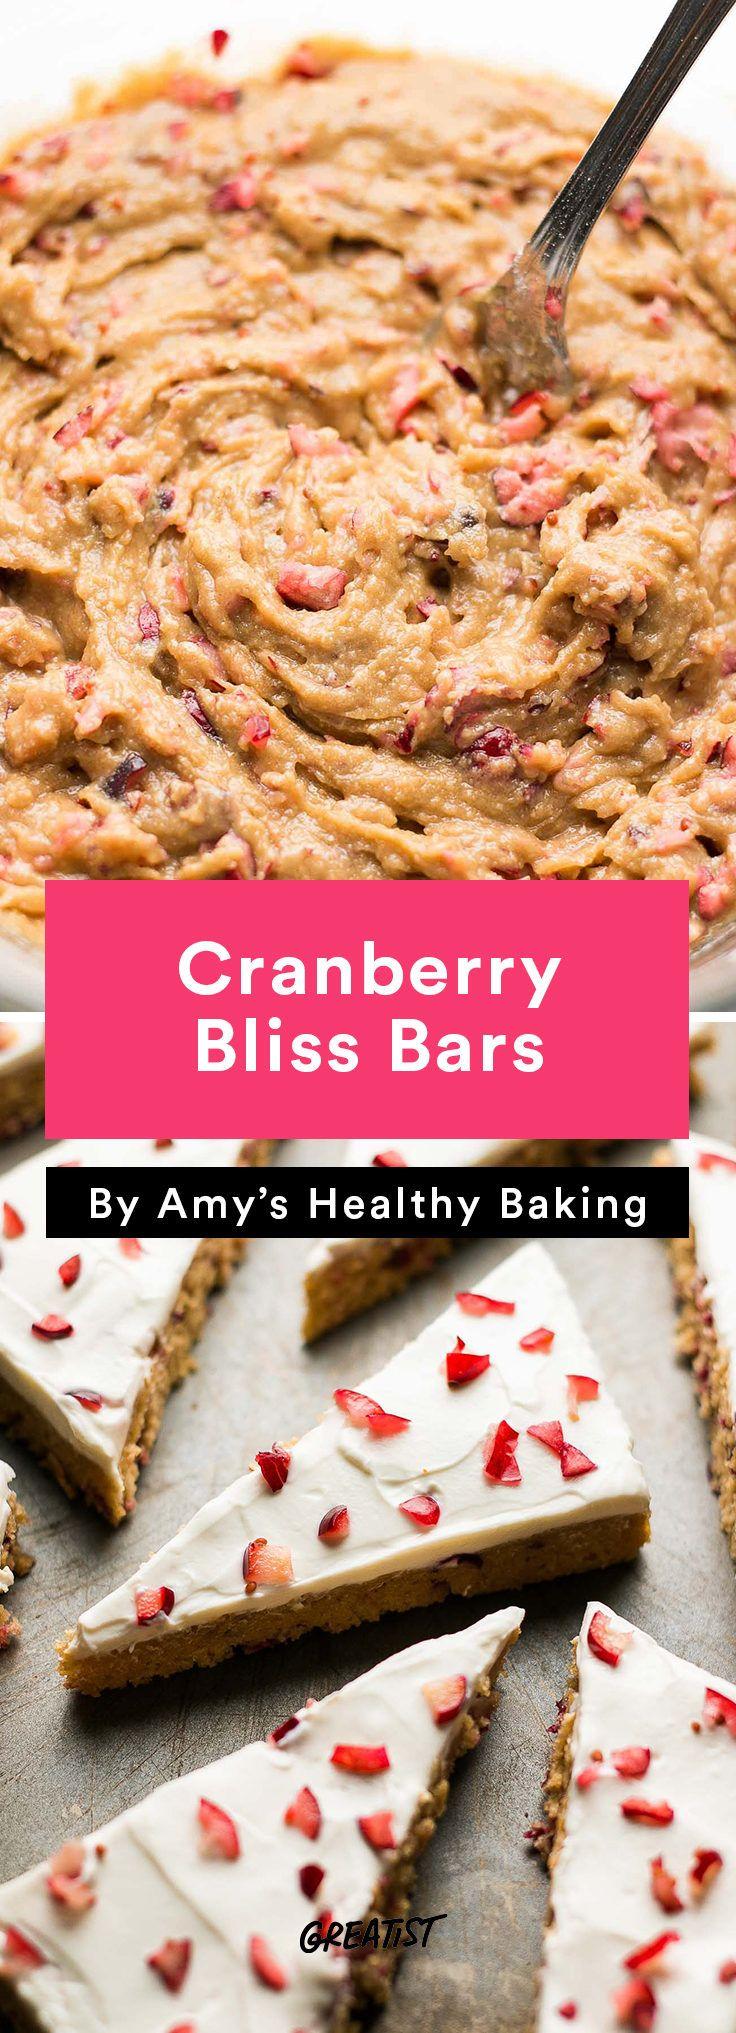 Starbucks Copycat Cranberry Bliss Bars